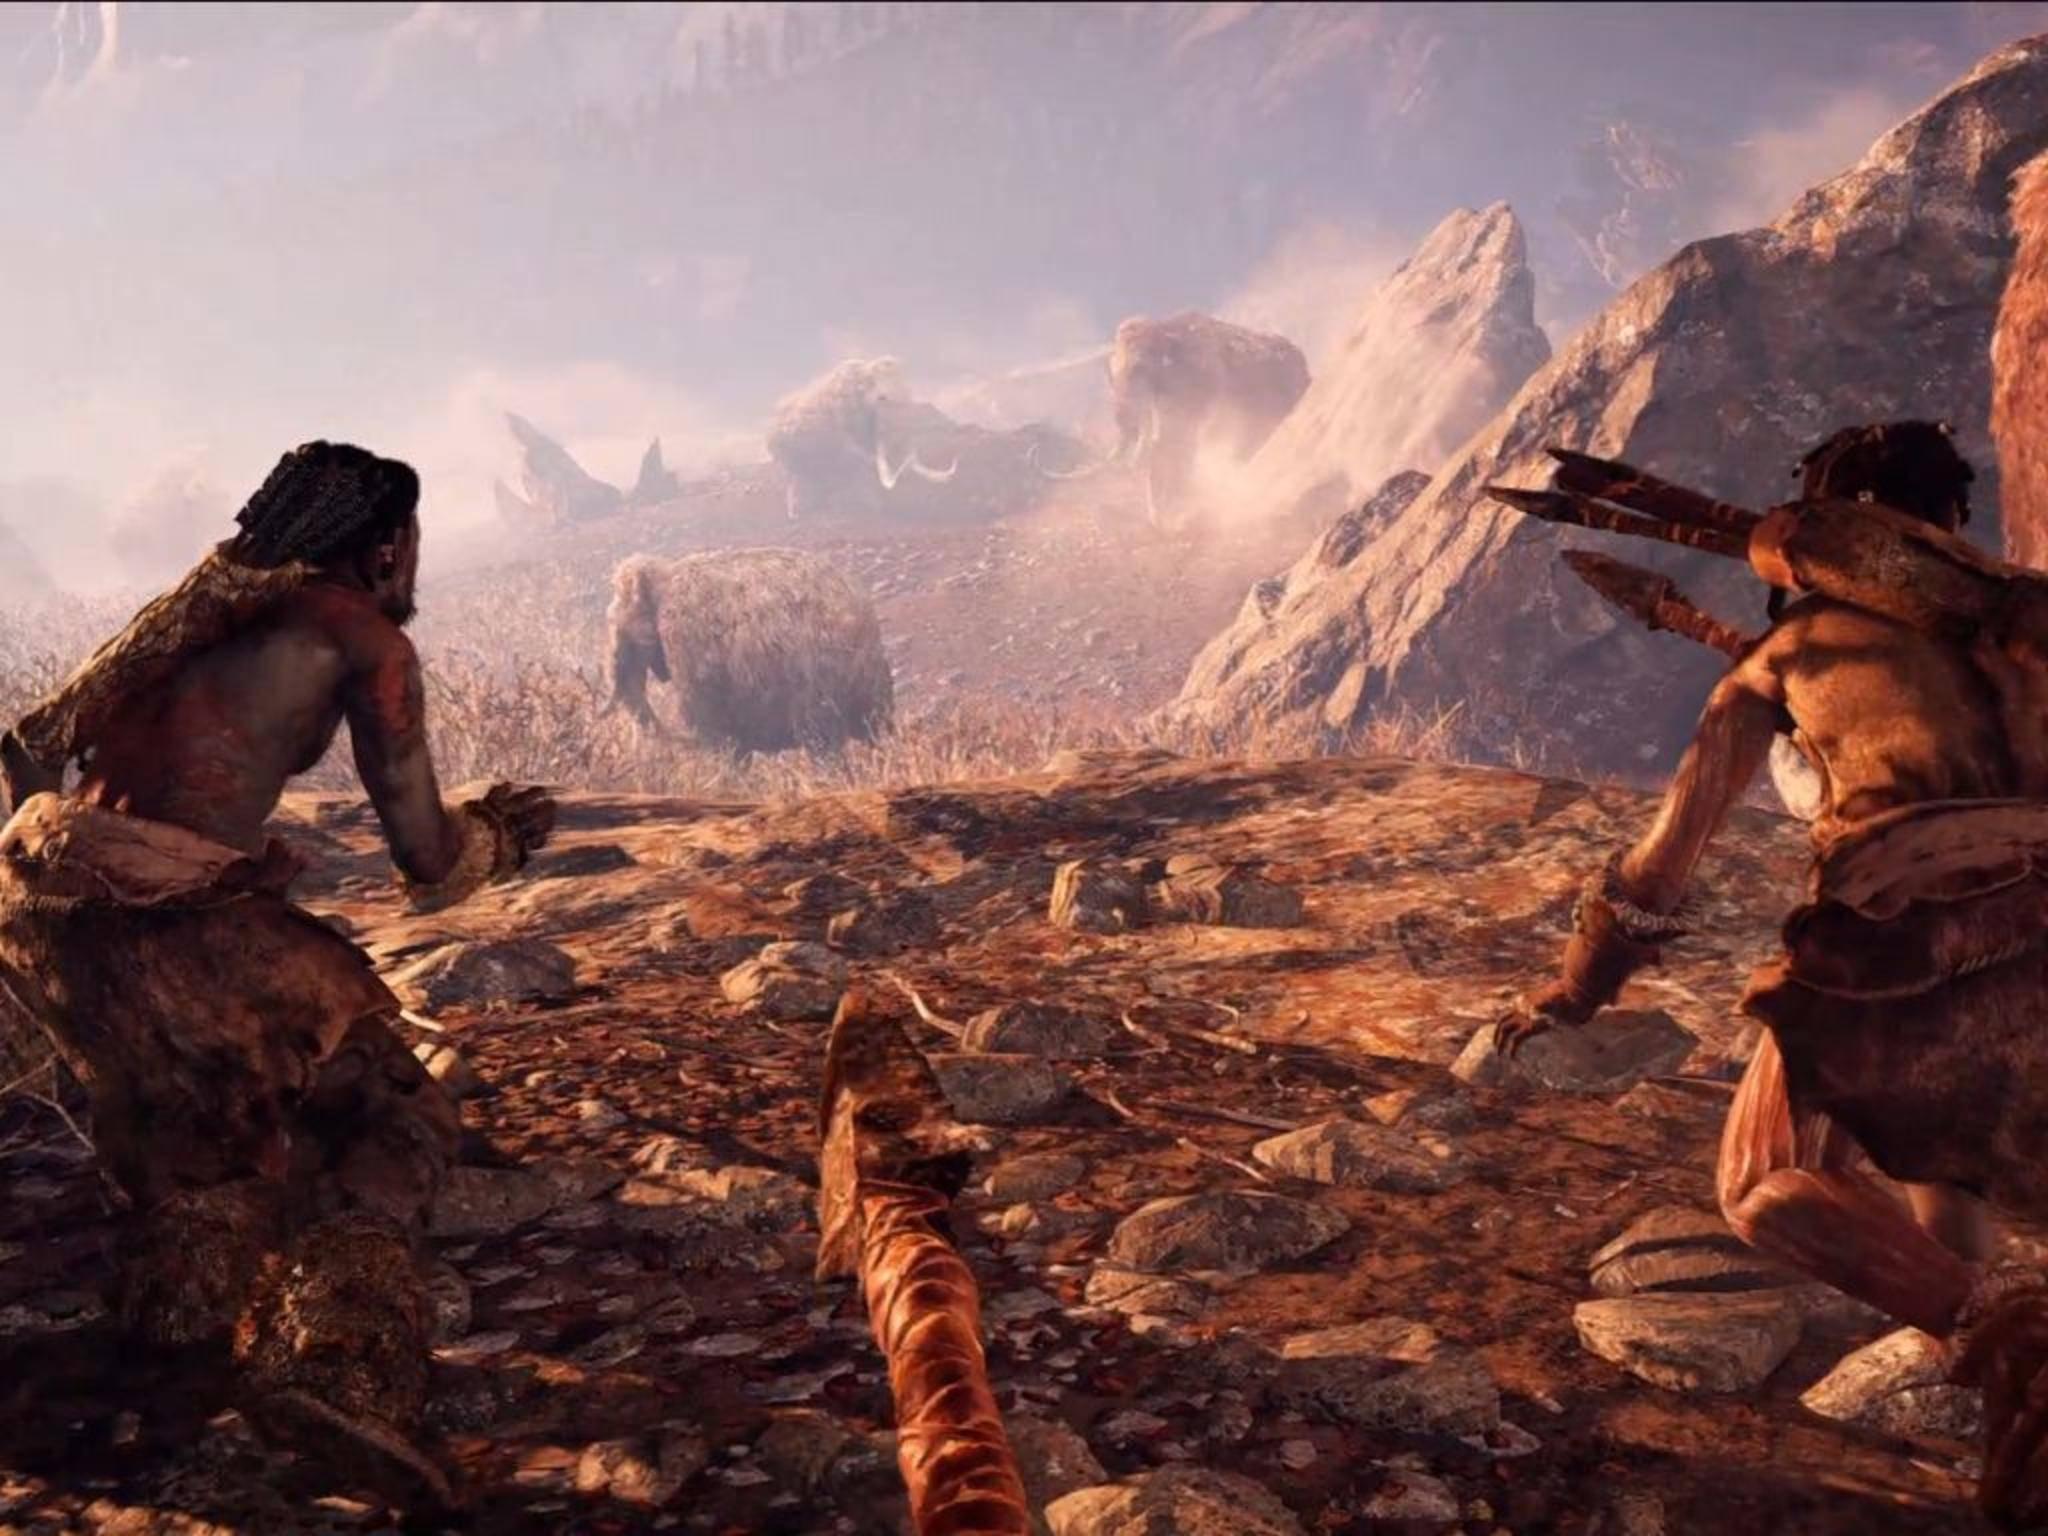 Far Cry Primal Screenshot 2